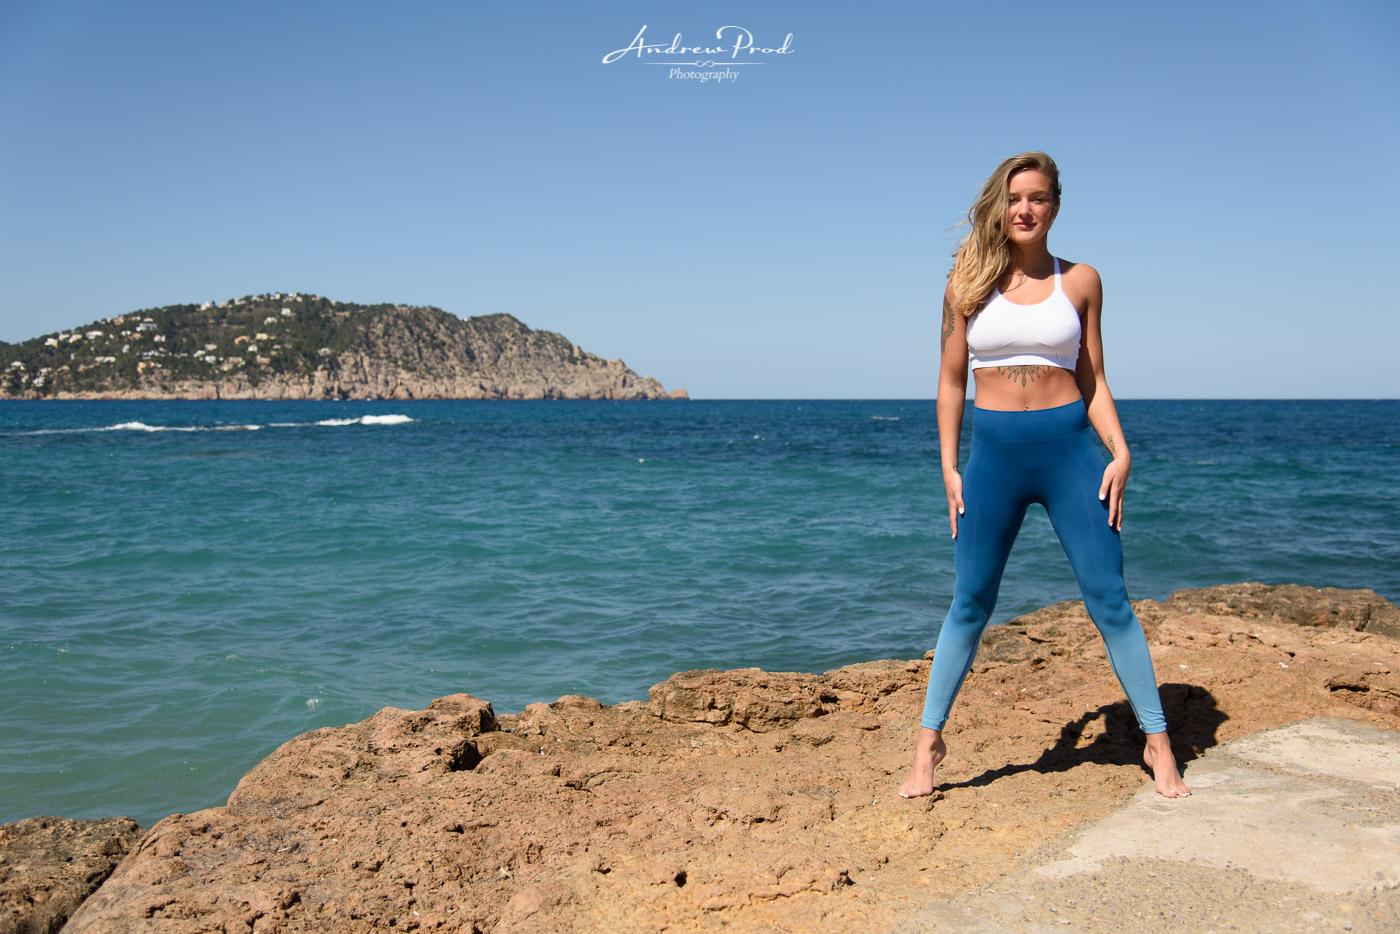 Ibiza beach photoshoot